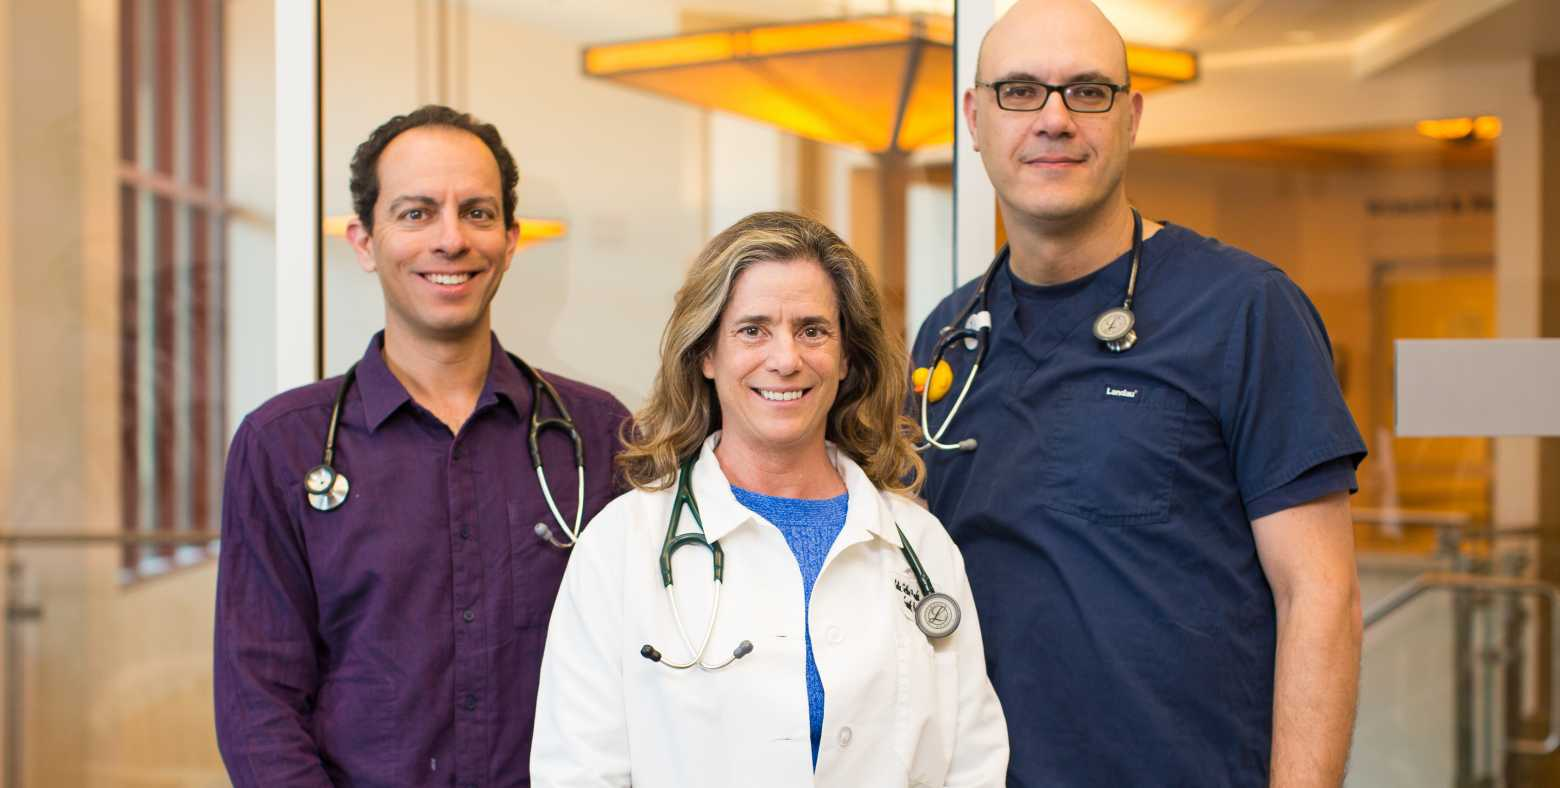 Dr. Celia Sutton-Pado. Dr. Oleg Vayner, and Dr. Joshua Scholnick